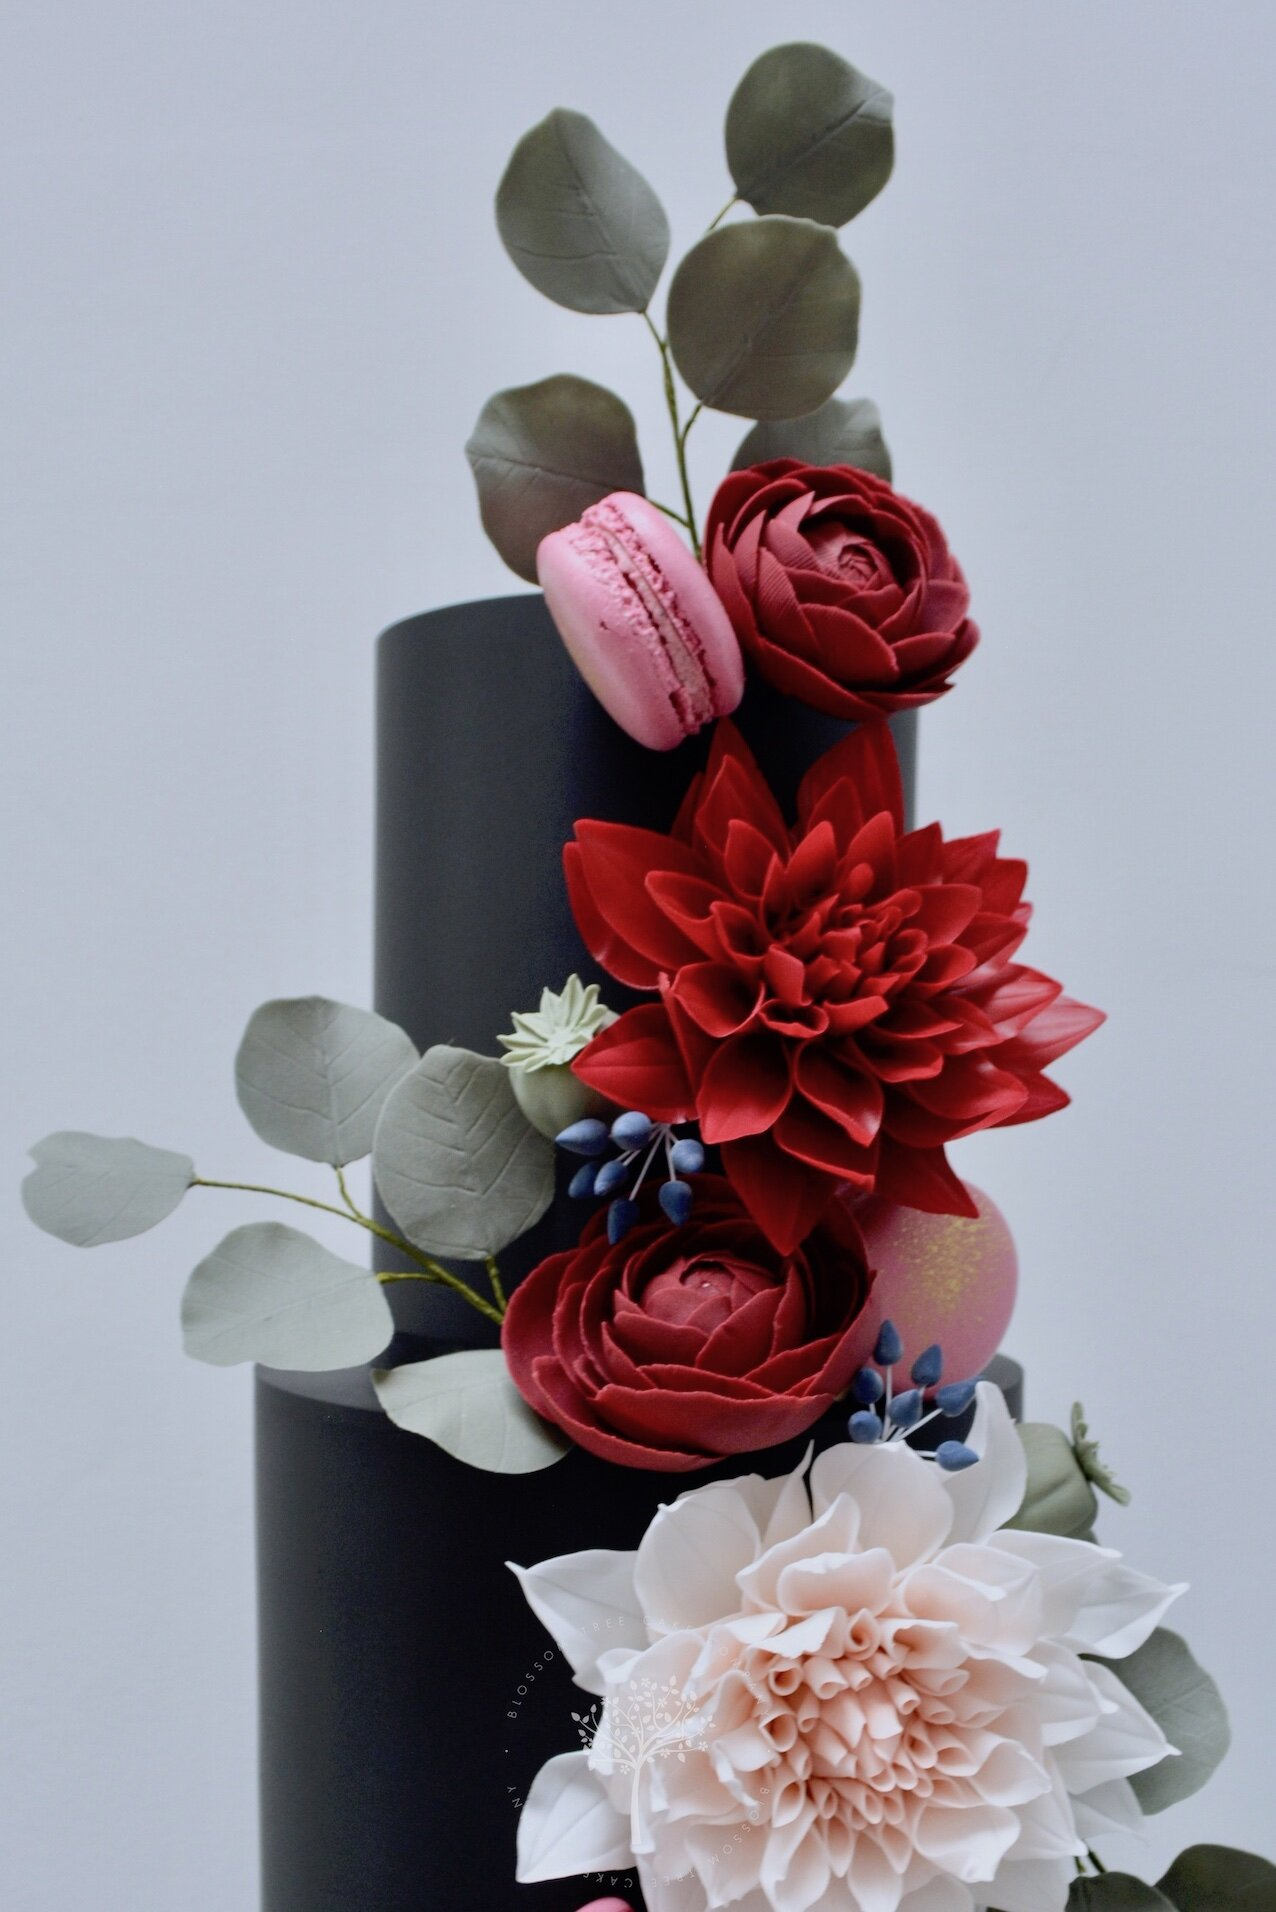 Autumn Blooms wedding cake by Blossom Tree Cake Company Harrogate North Yorkshire - top sugar dahlias and ranunculus.jpg